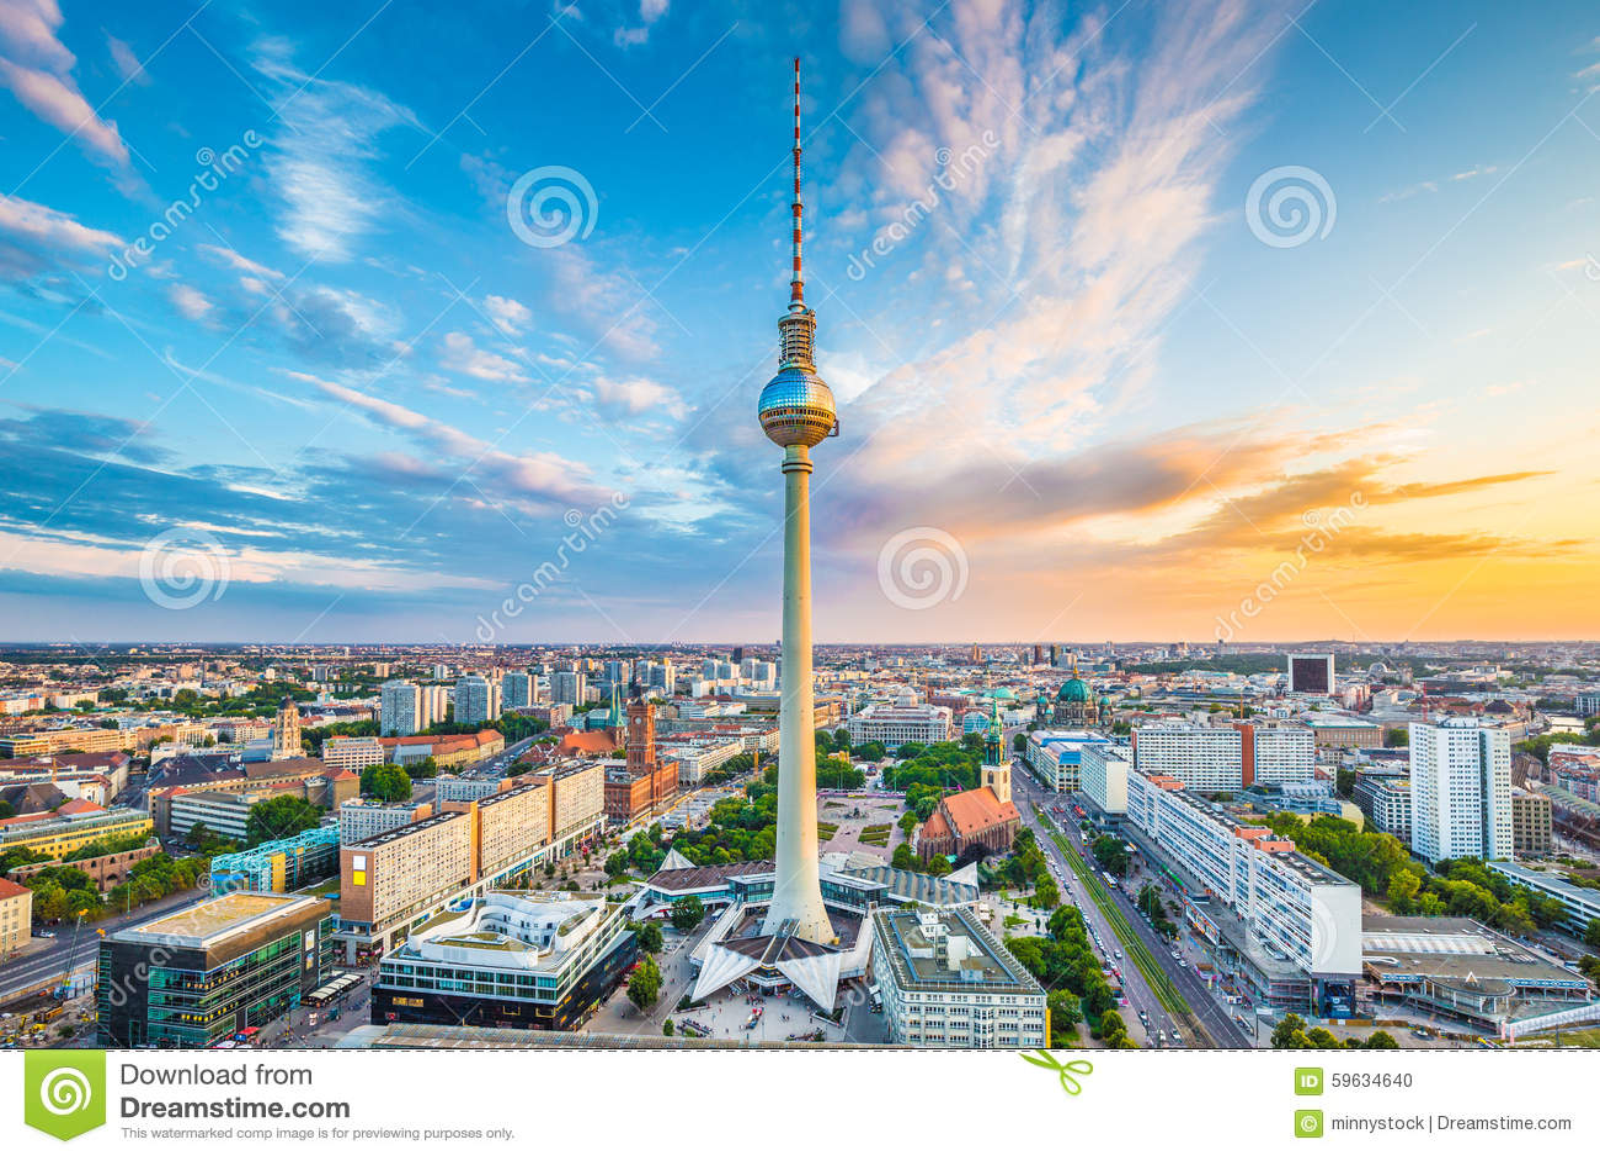 berlin skylinepanorama mit fernsehturm bei sonnenaufgang deutschland stockfoto bild 59634640. Black Bedroom Furniture Sets. Home Design Ideas